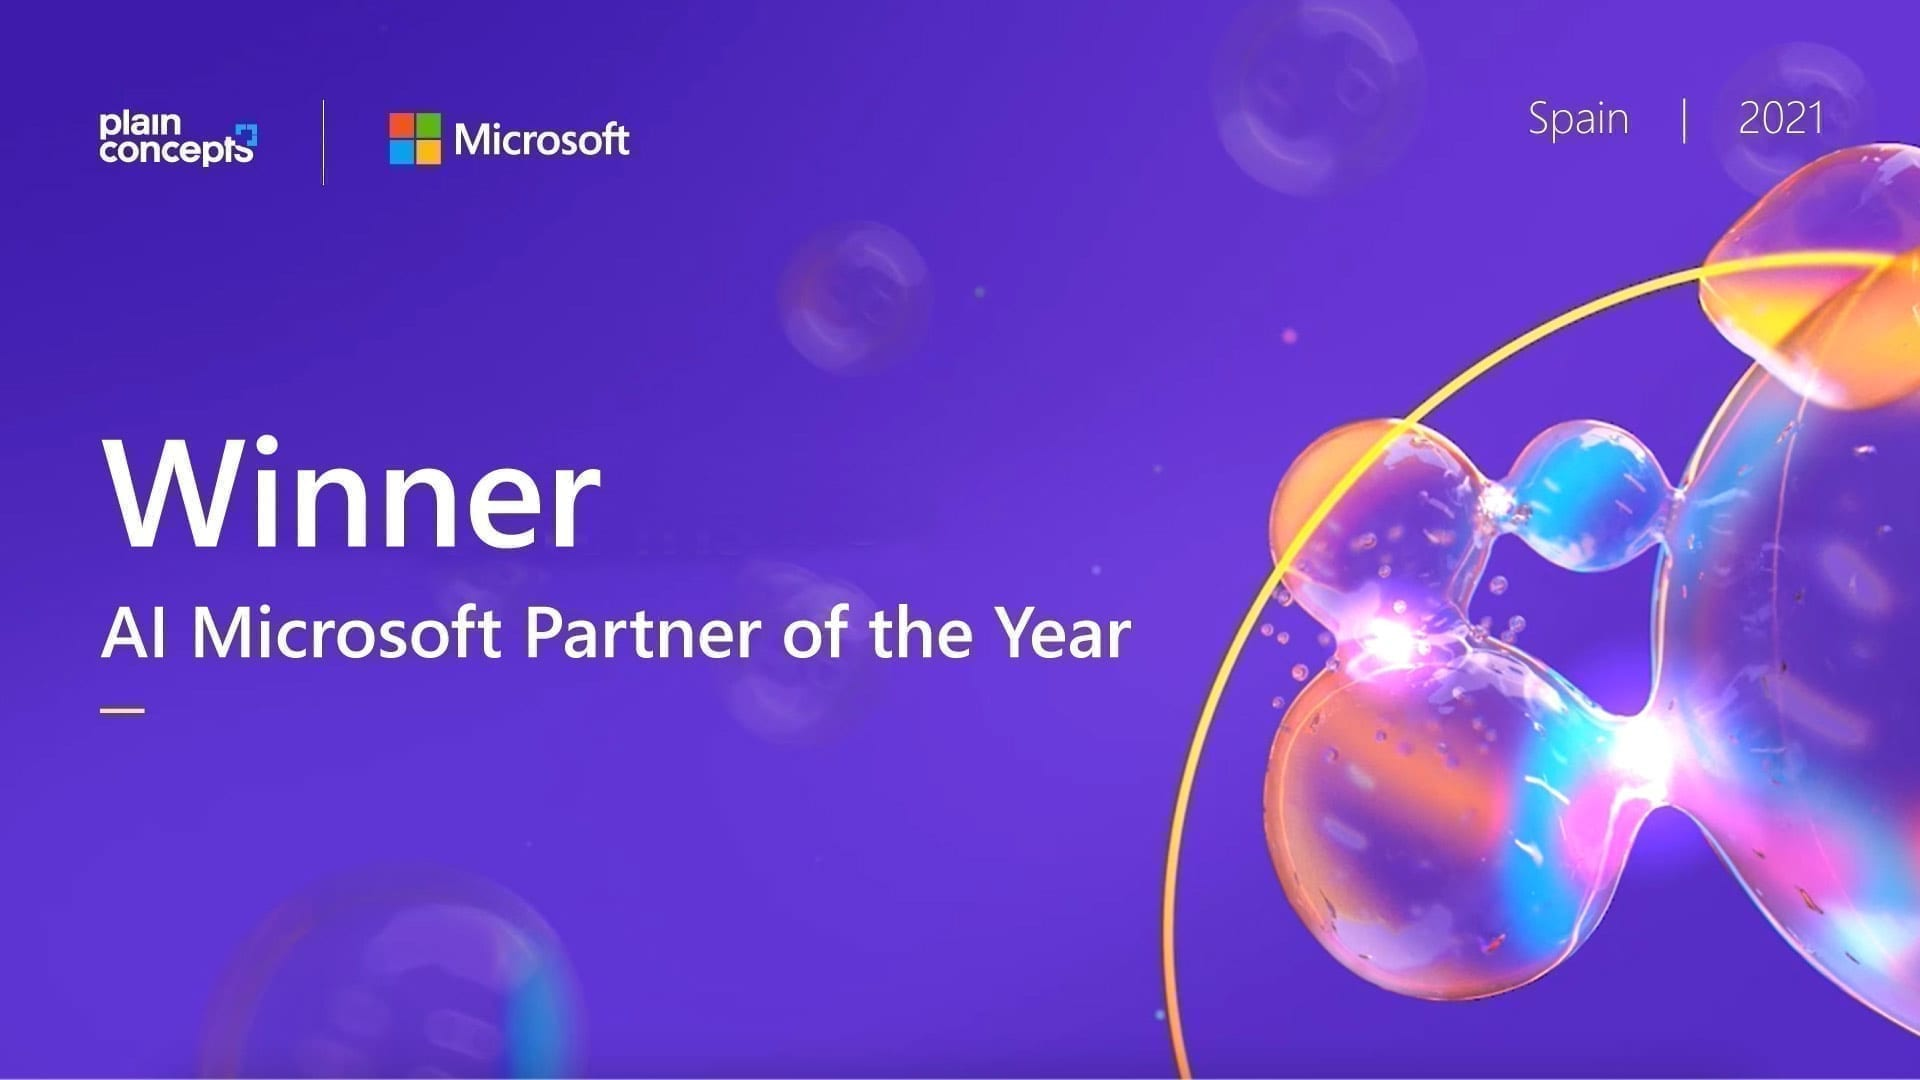 AI Microsoft partner of the year